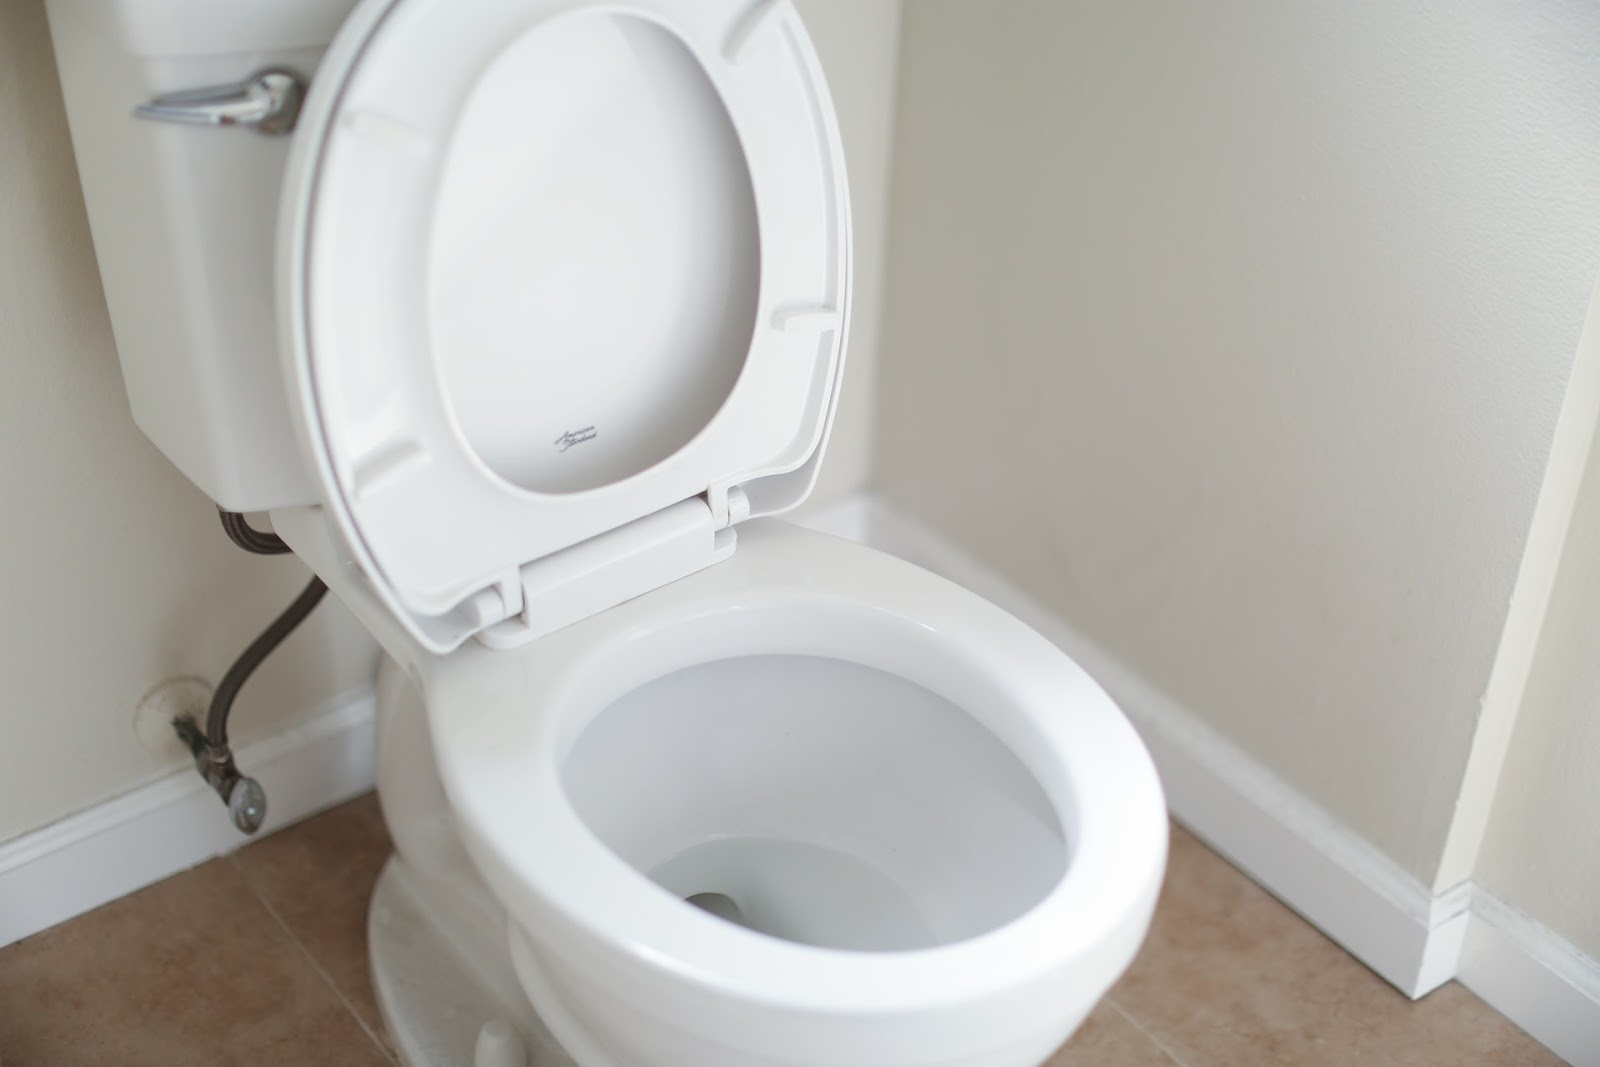 Um vaso sanitário aberto.